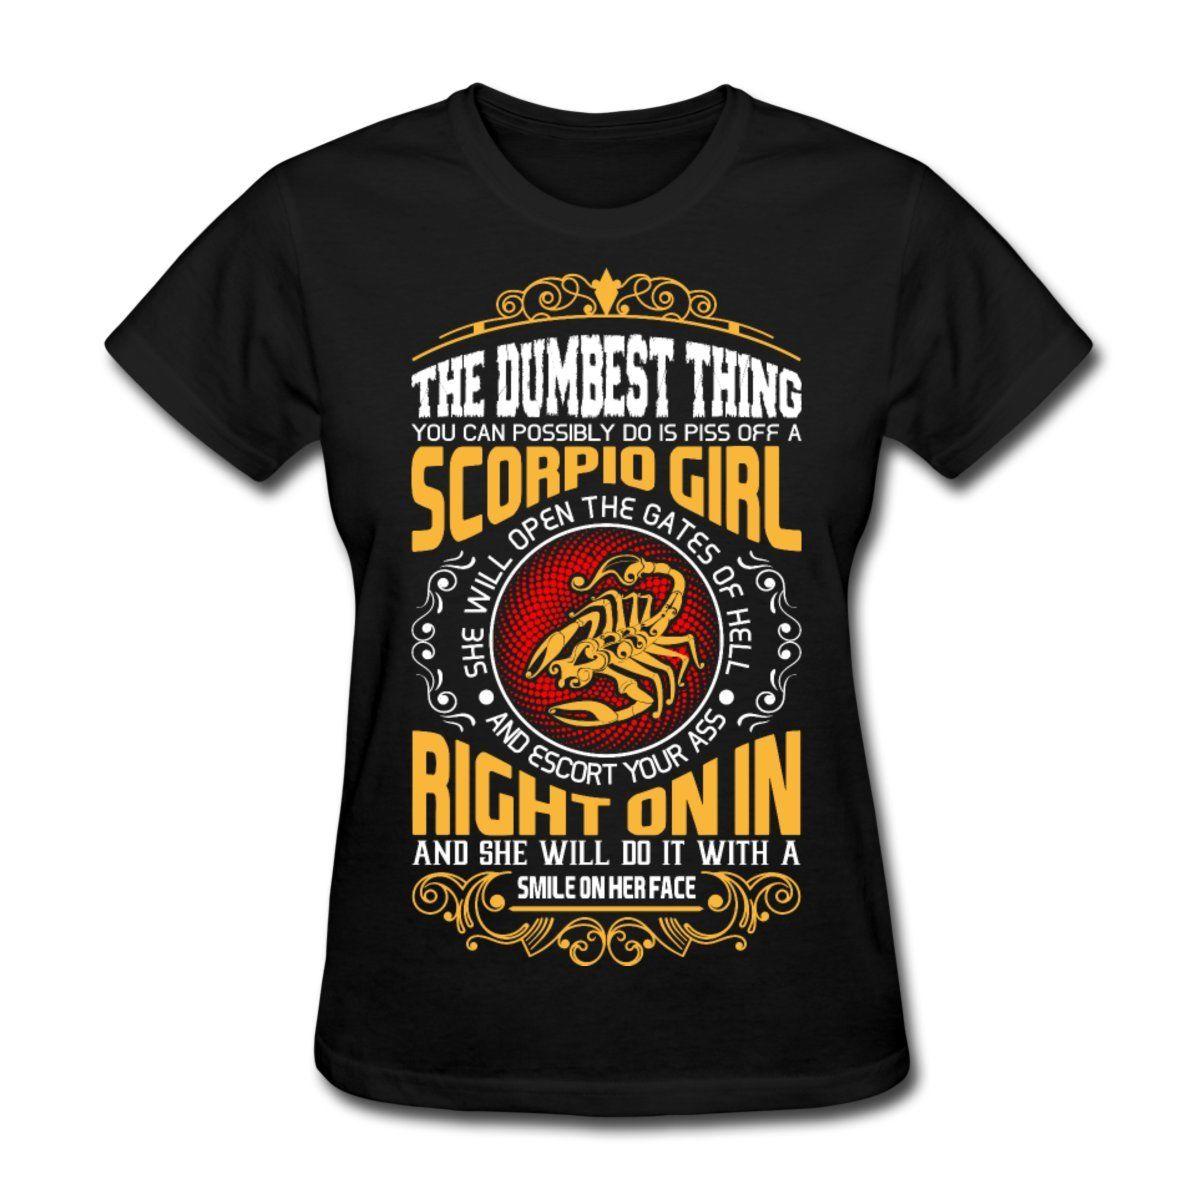 US $13.04 13% OFF|Zodiac Scorpio Girl Funny Quote Women\'s T Shirt Funny  Cotton Casual Tee Shirt Femme Western Style Shirt Kawaii T Shirt Lady-in ...